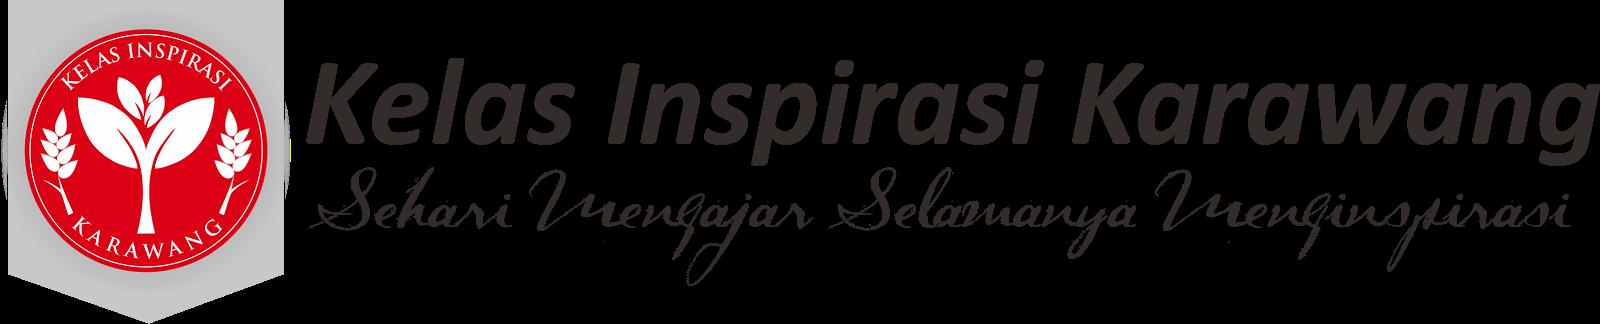 Kelas Inspirasi Karawang